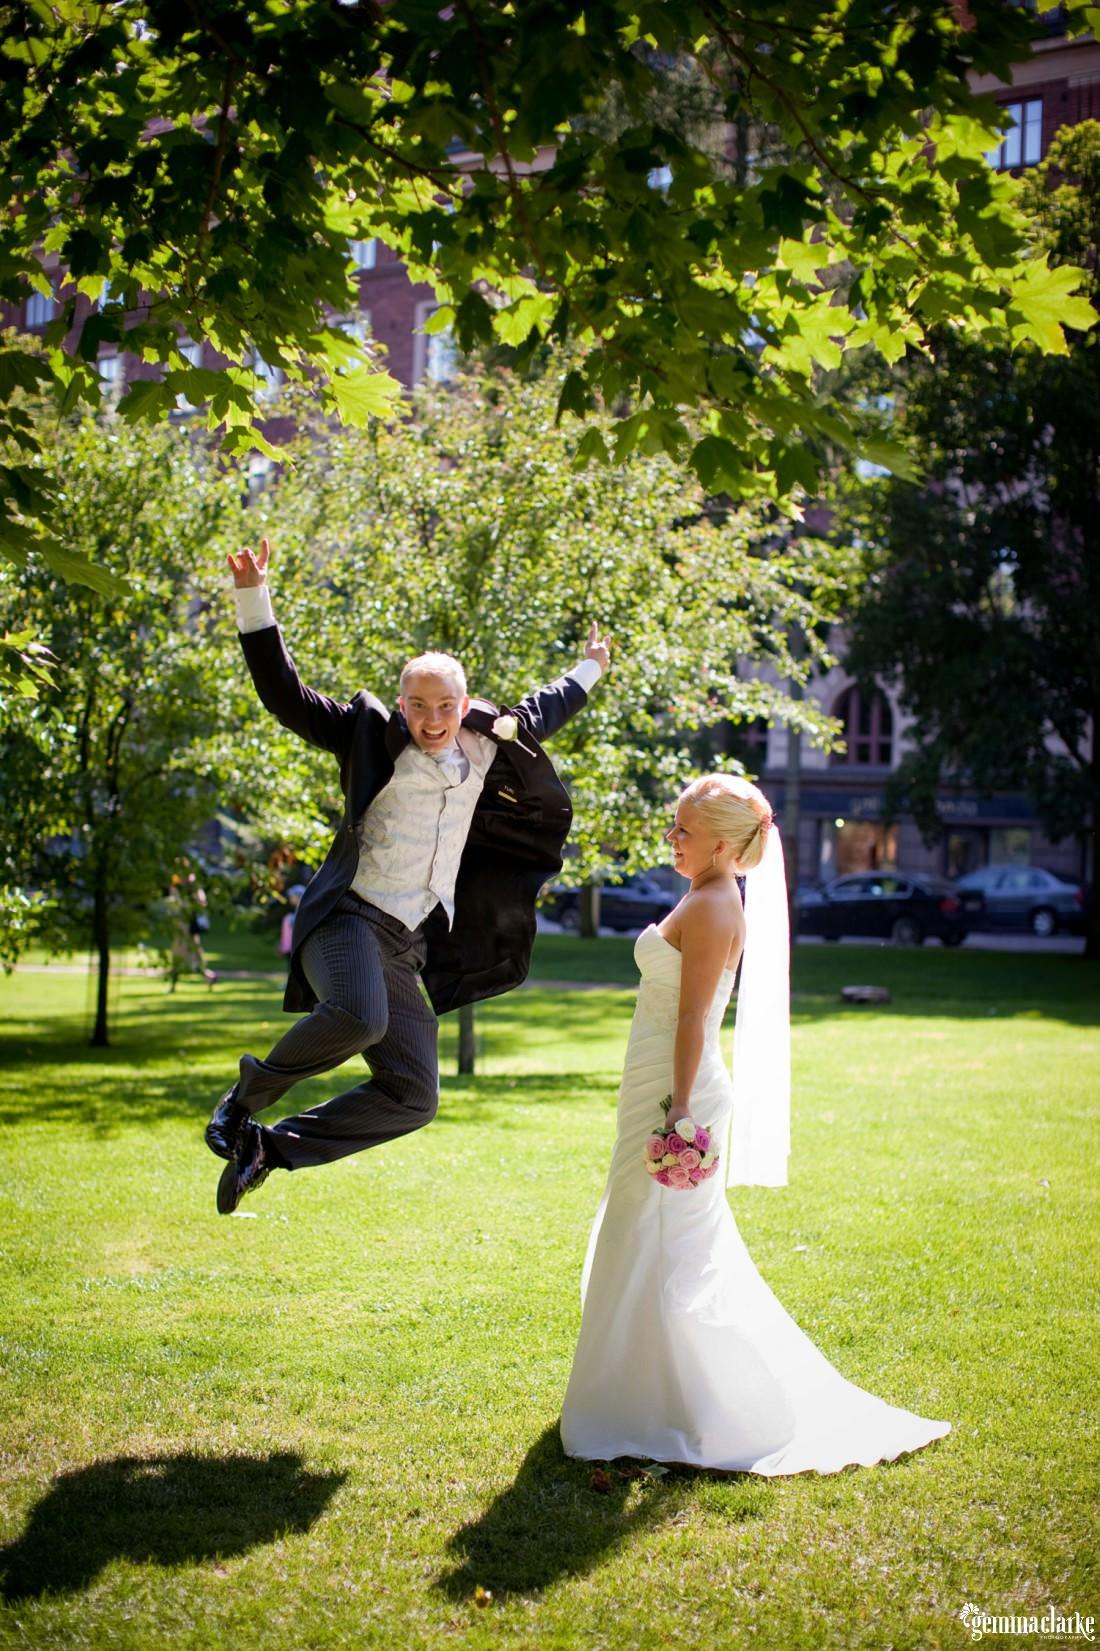 gemma-clarke-photography_helsinki-wedding_tanja-and-jukka_0020